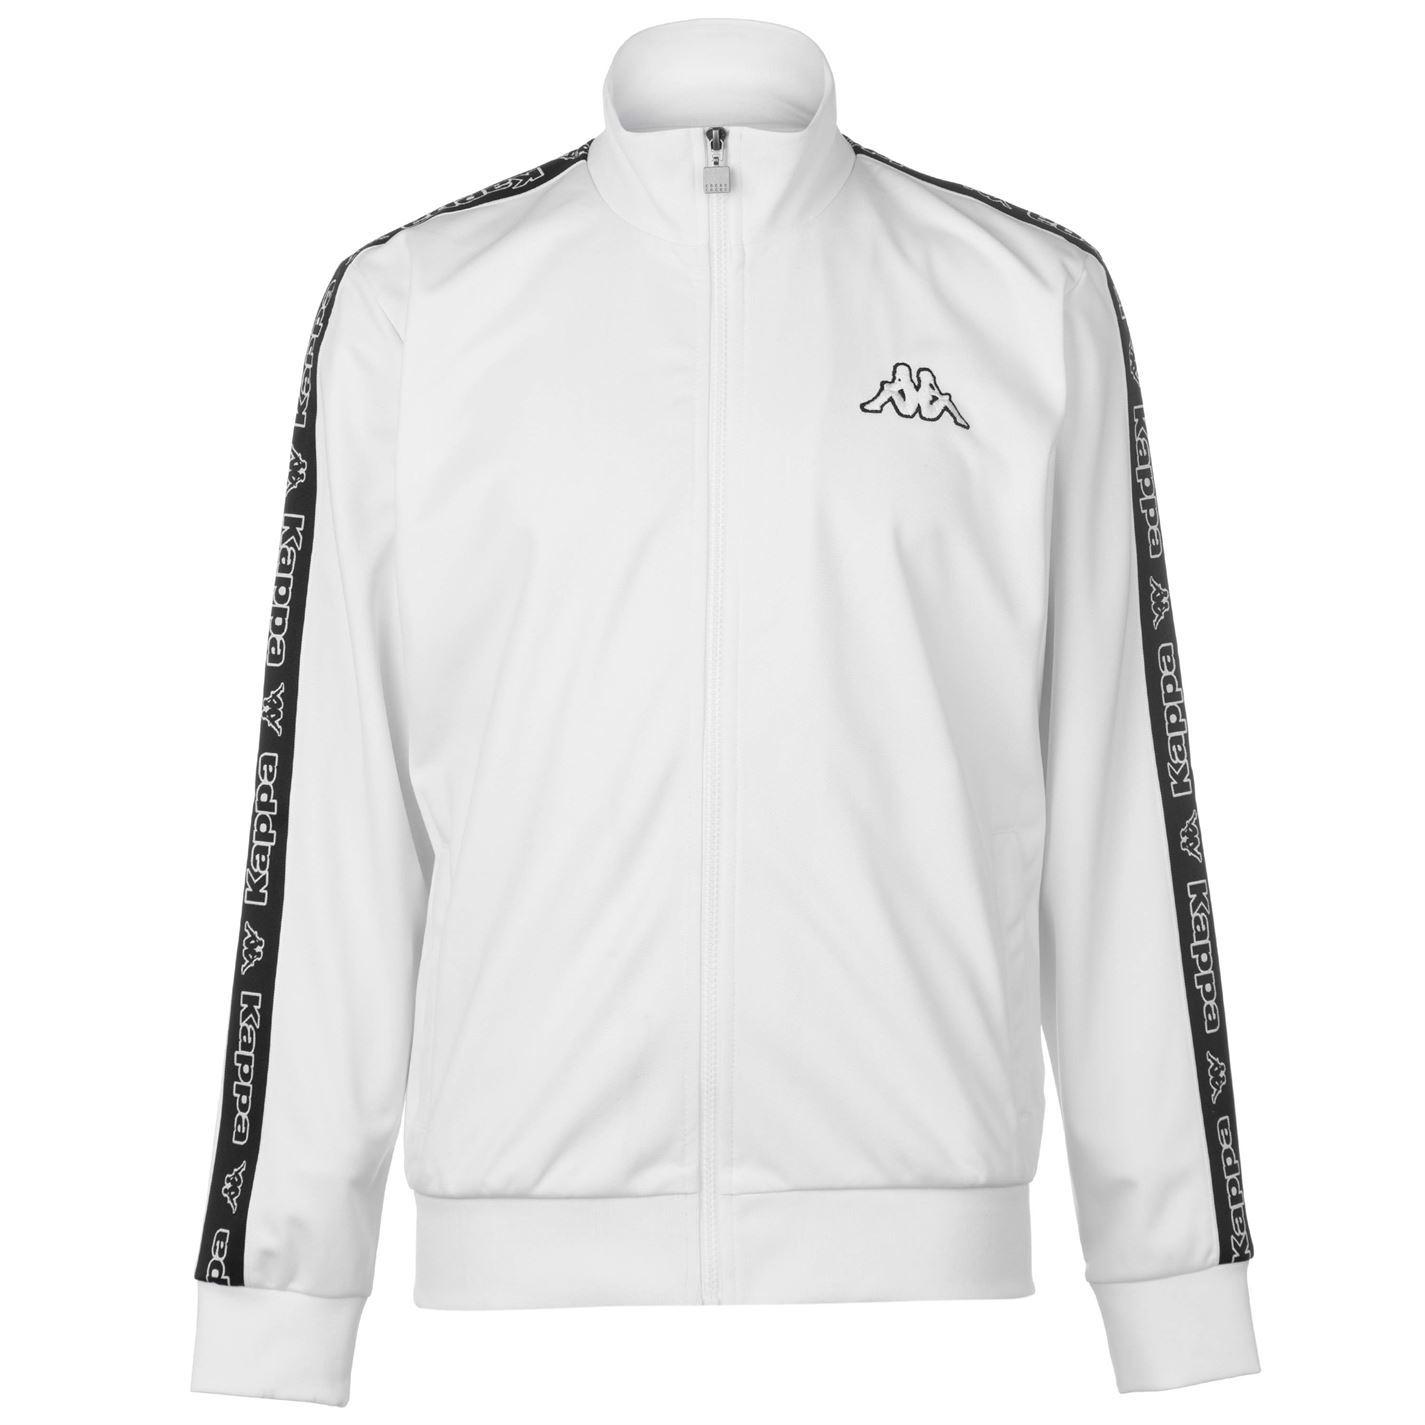 Black and white kappa jacket